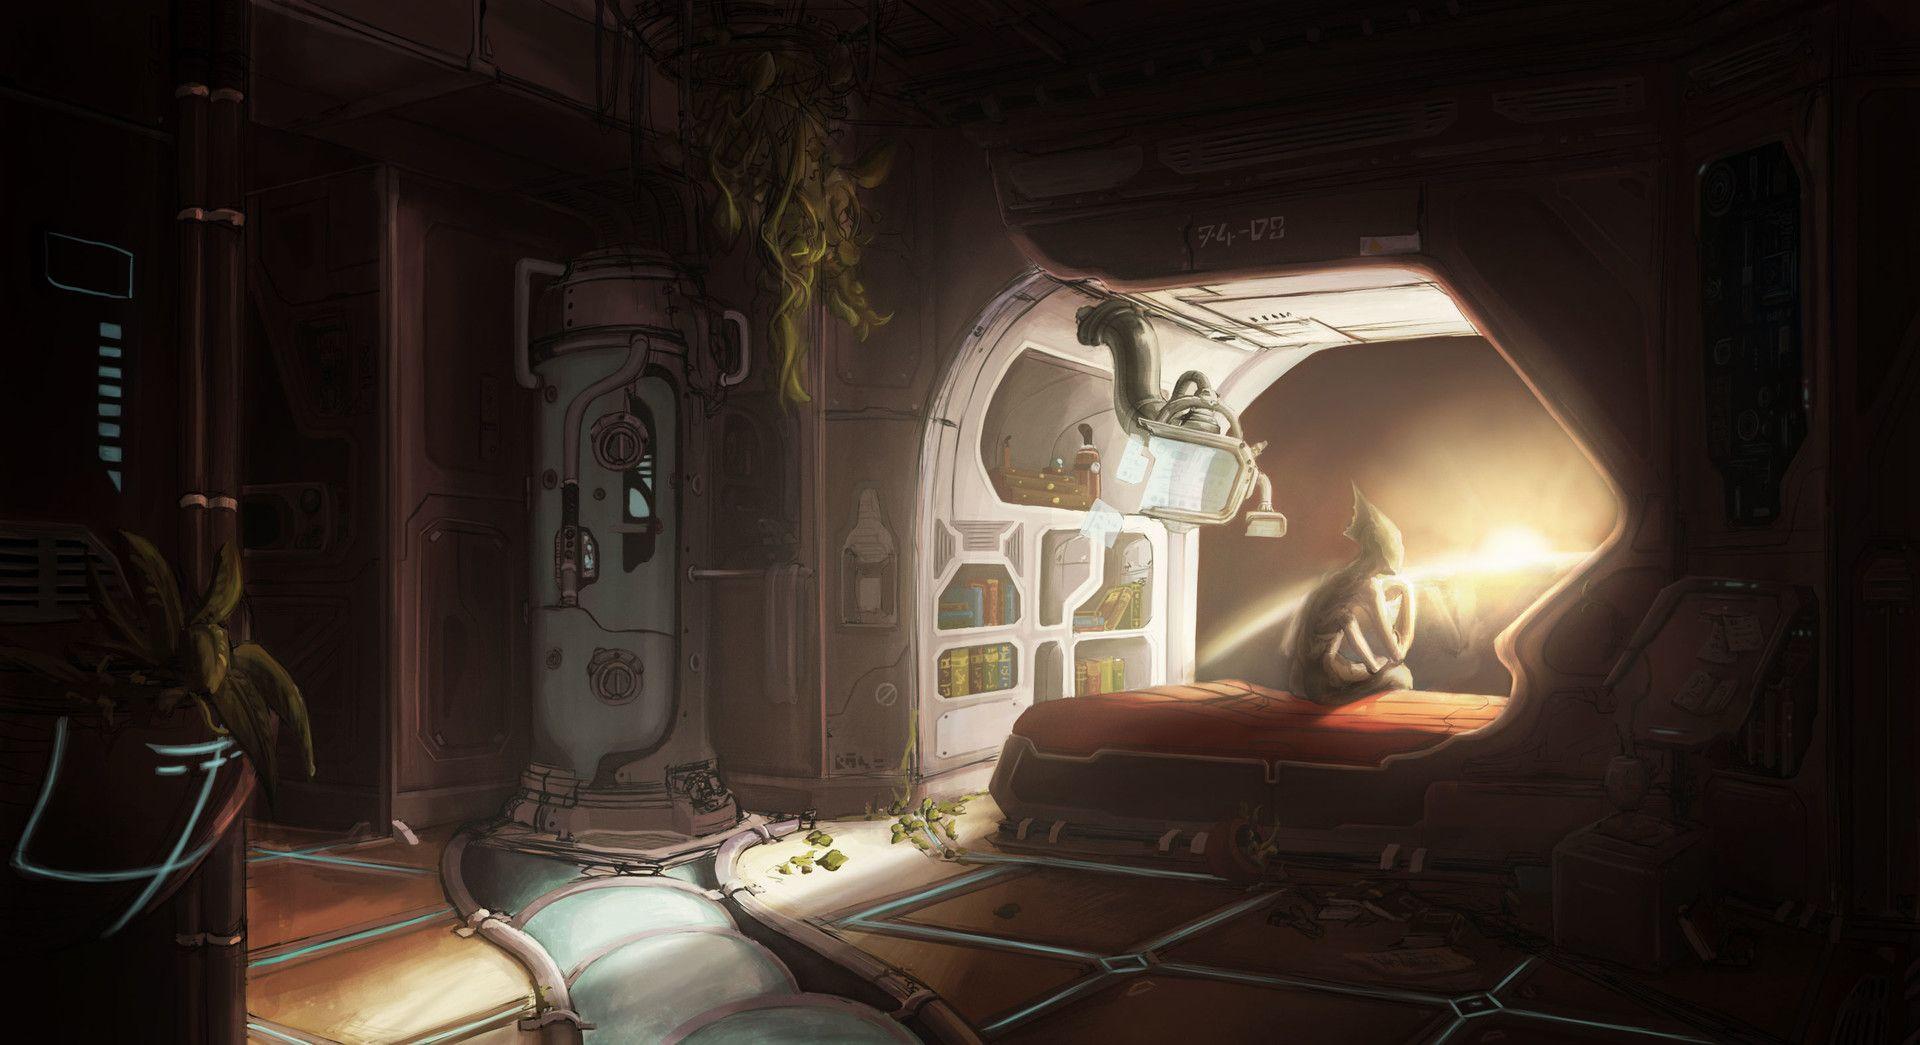 ArtStation - Spaceship Bedroom, Sarah Veniel